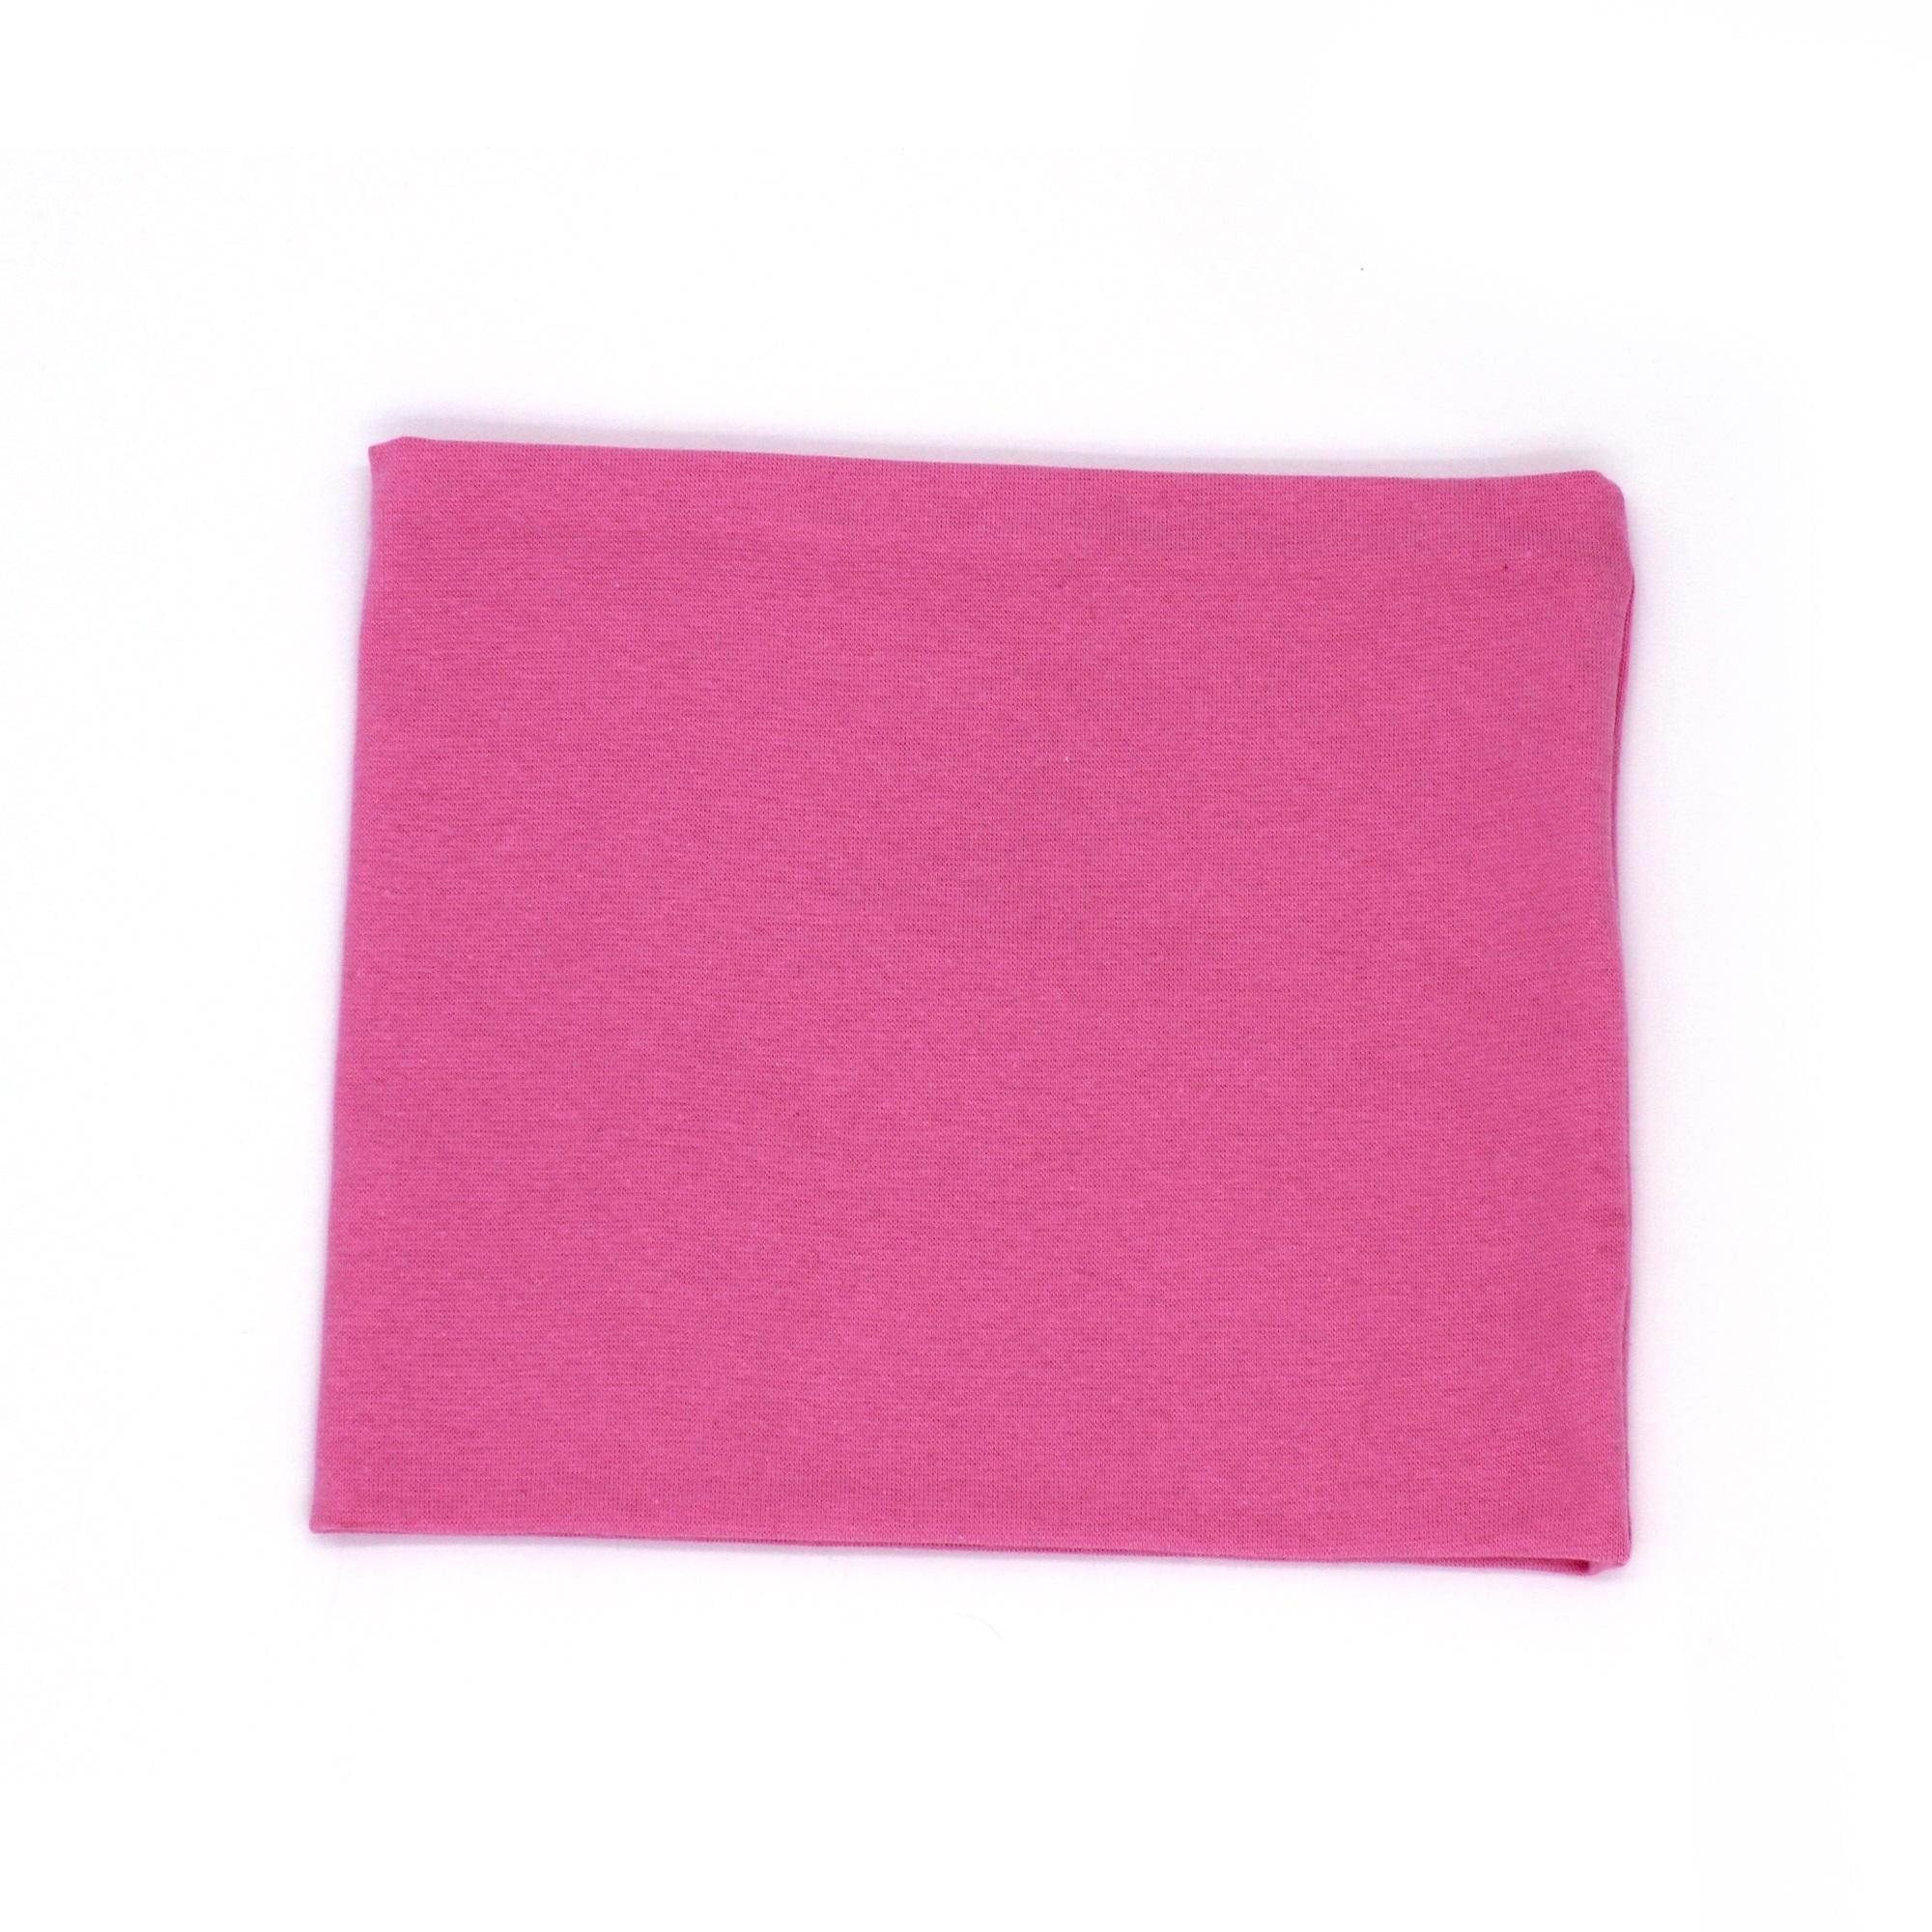 Шарф Nais, цвет: розовый р.50-52 ДС.Снуд (розовый яркий)